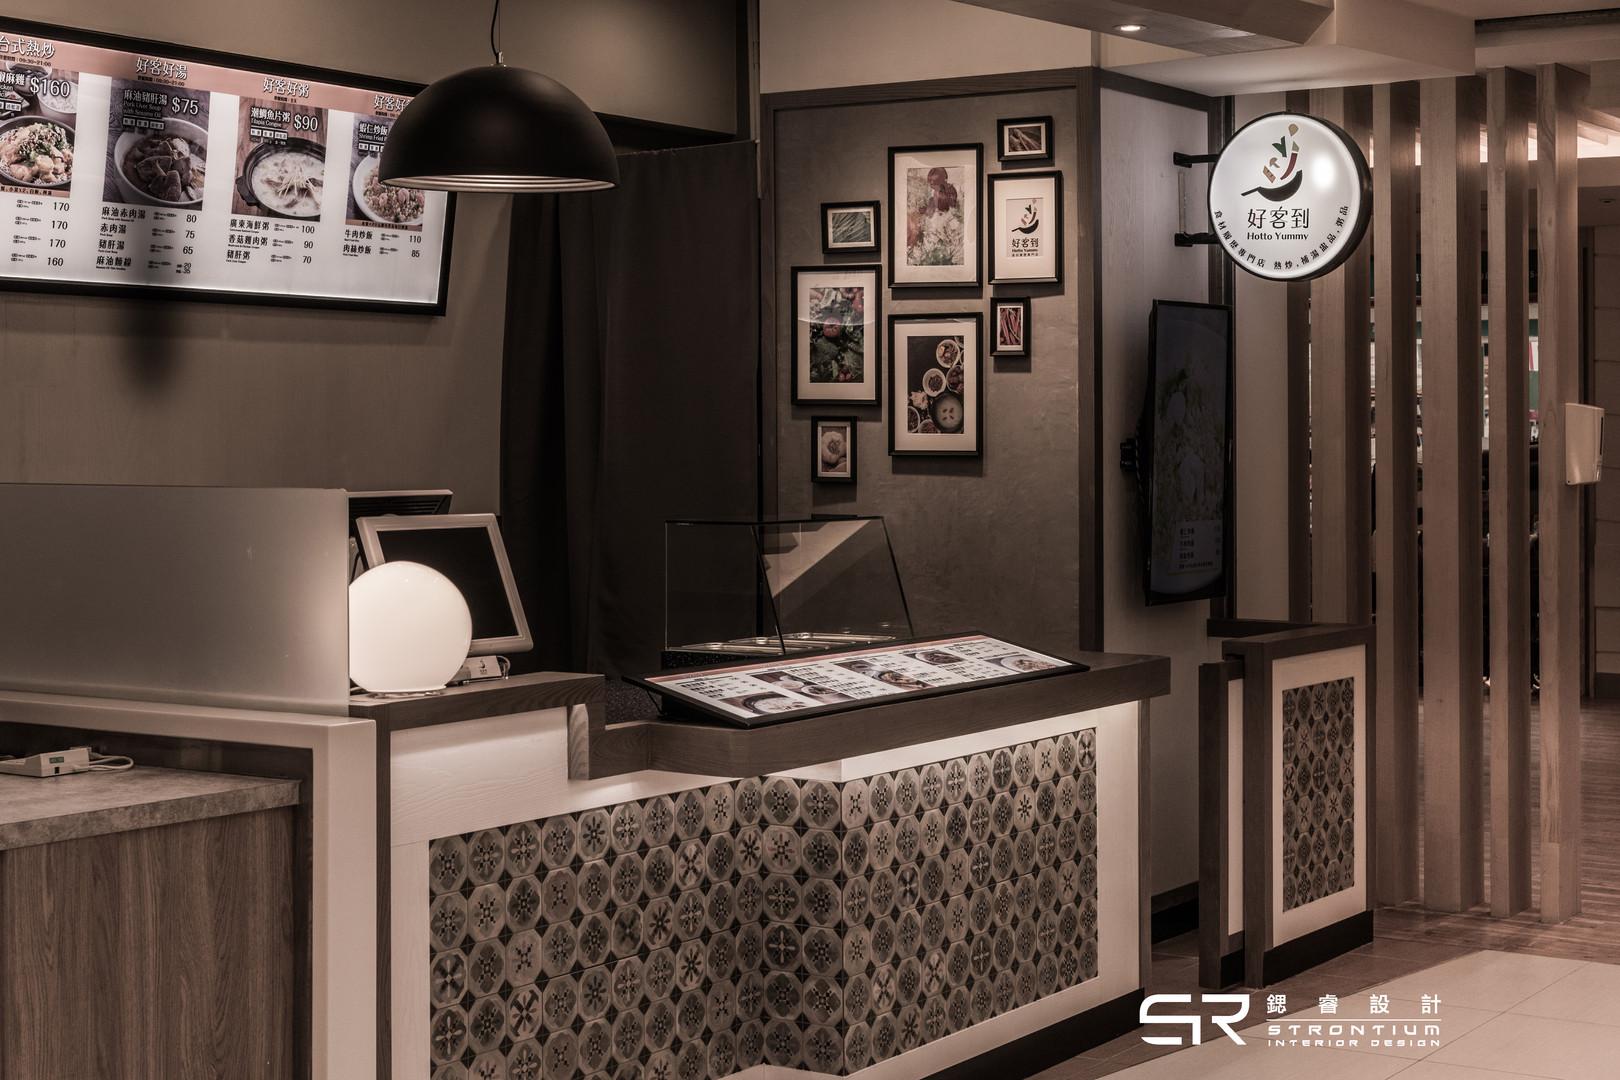 SR-1702-榮總員工餐廳-64=拷貝.jpg